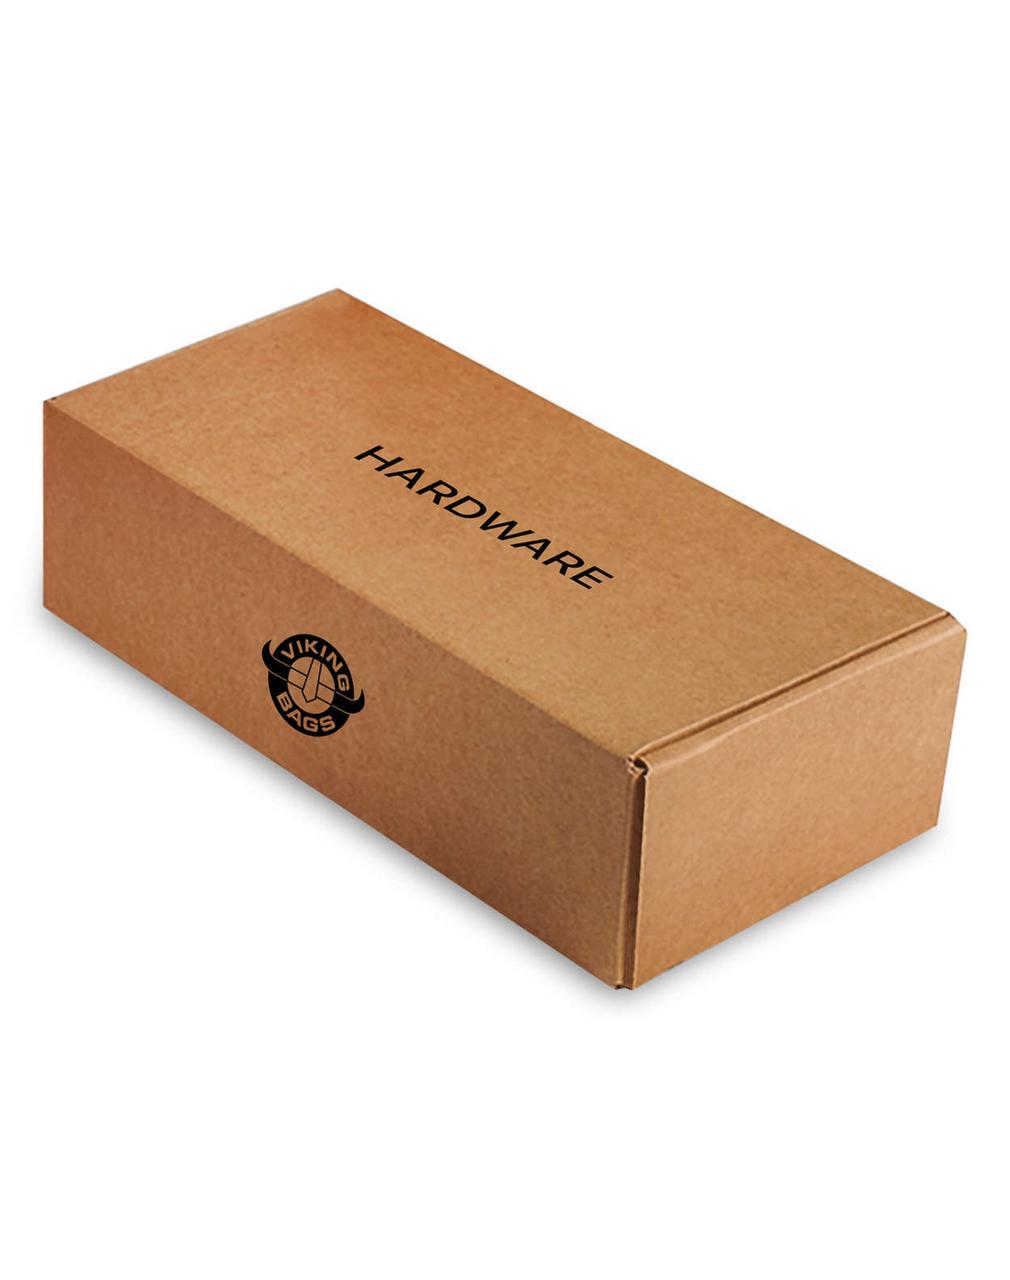 Honda 750 Shadow Phantom Viking Lamellar Large Leather Covered Hard Saddlebags box